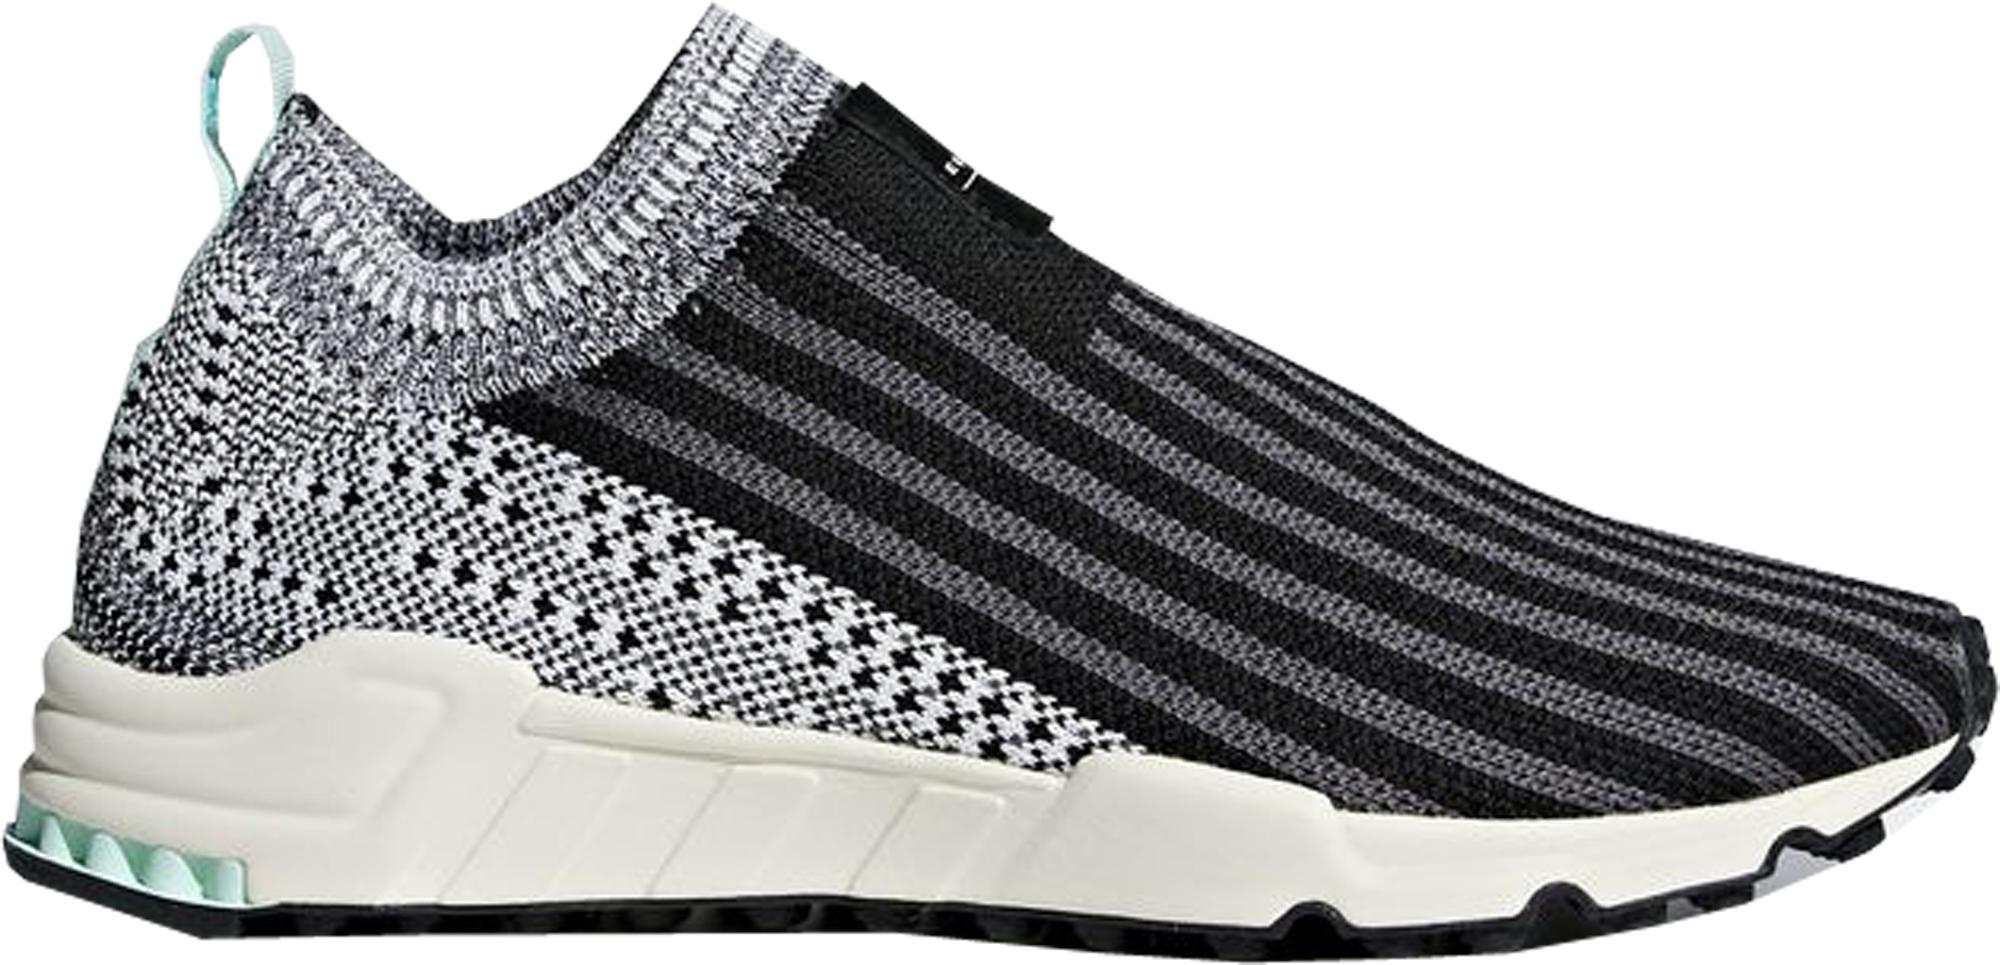 adidas EQT Support Sock Black White Clear Mint (W)